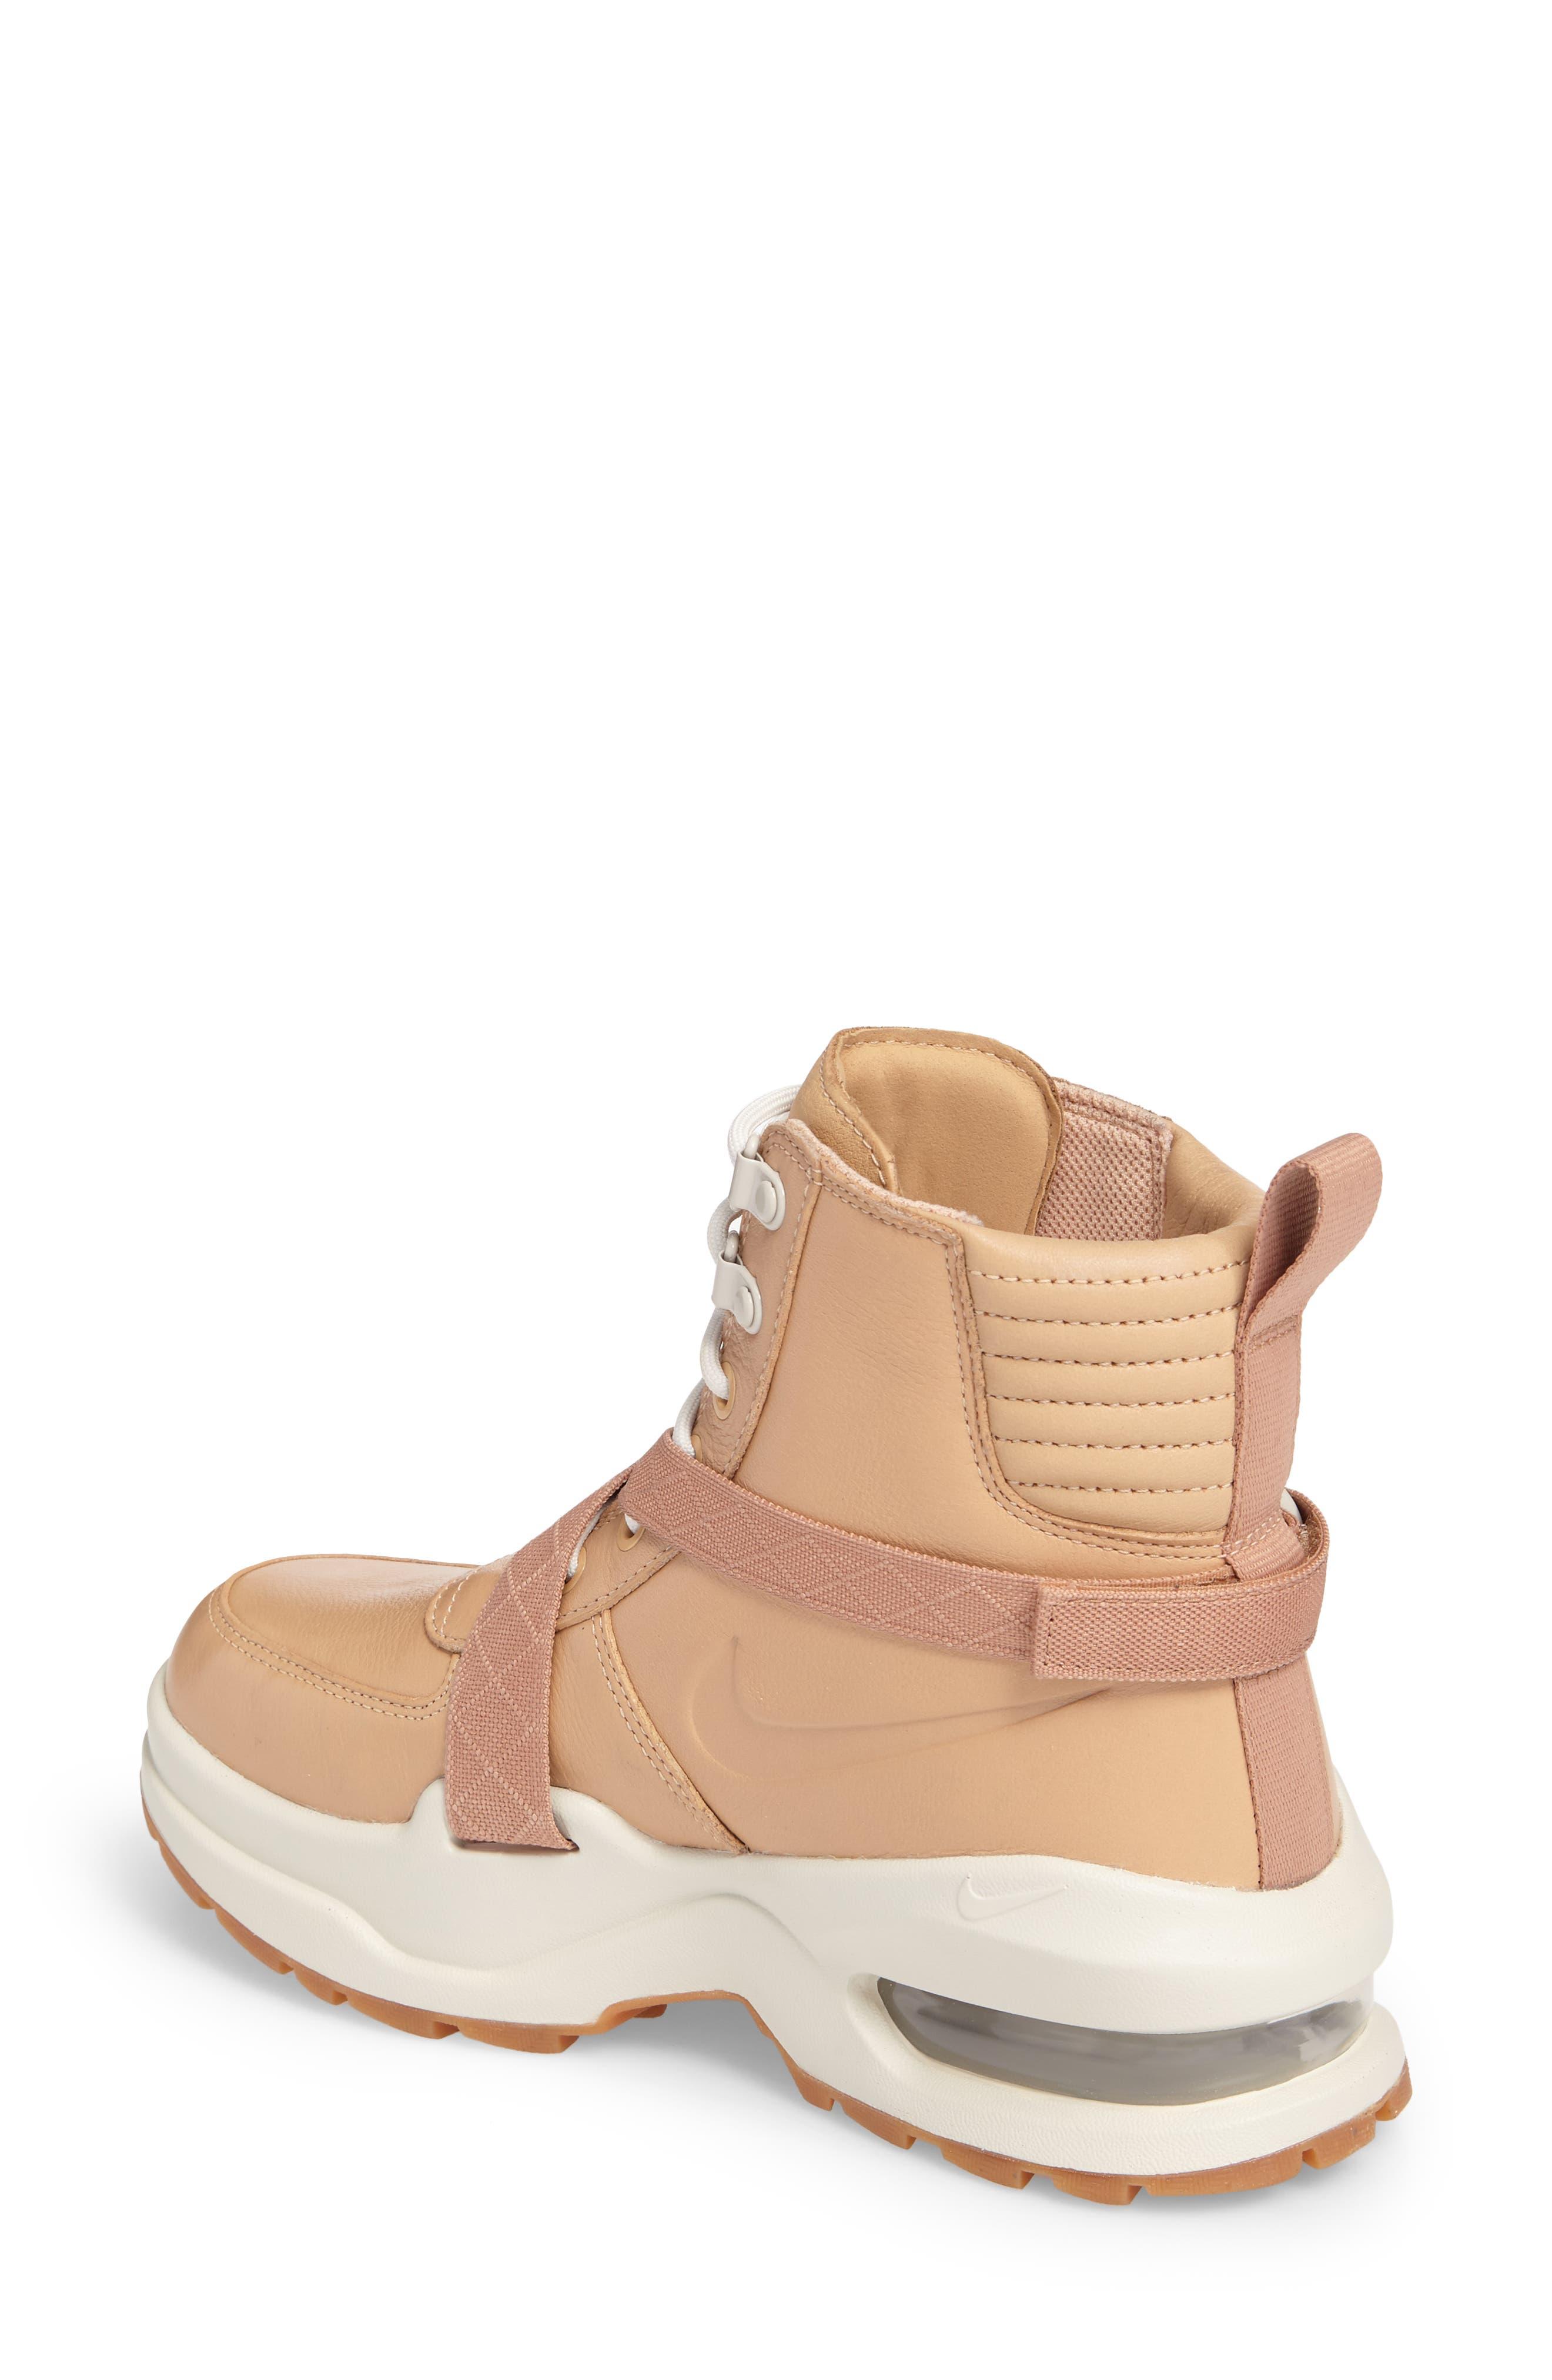 Air Max Goadome Sneaker Boot,                             Alternate thumbnail 2, color,                             Tan/ Tan/ Light Bone/ Clay